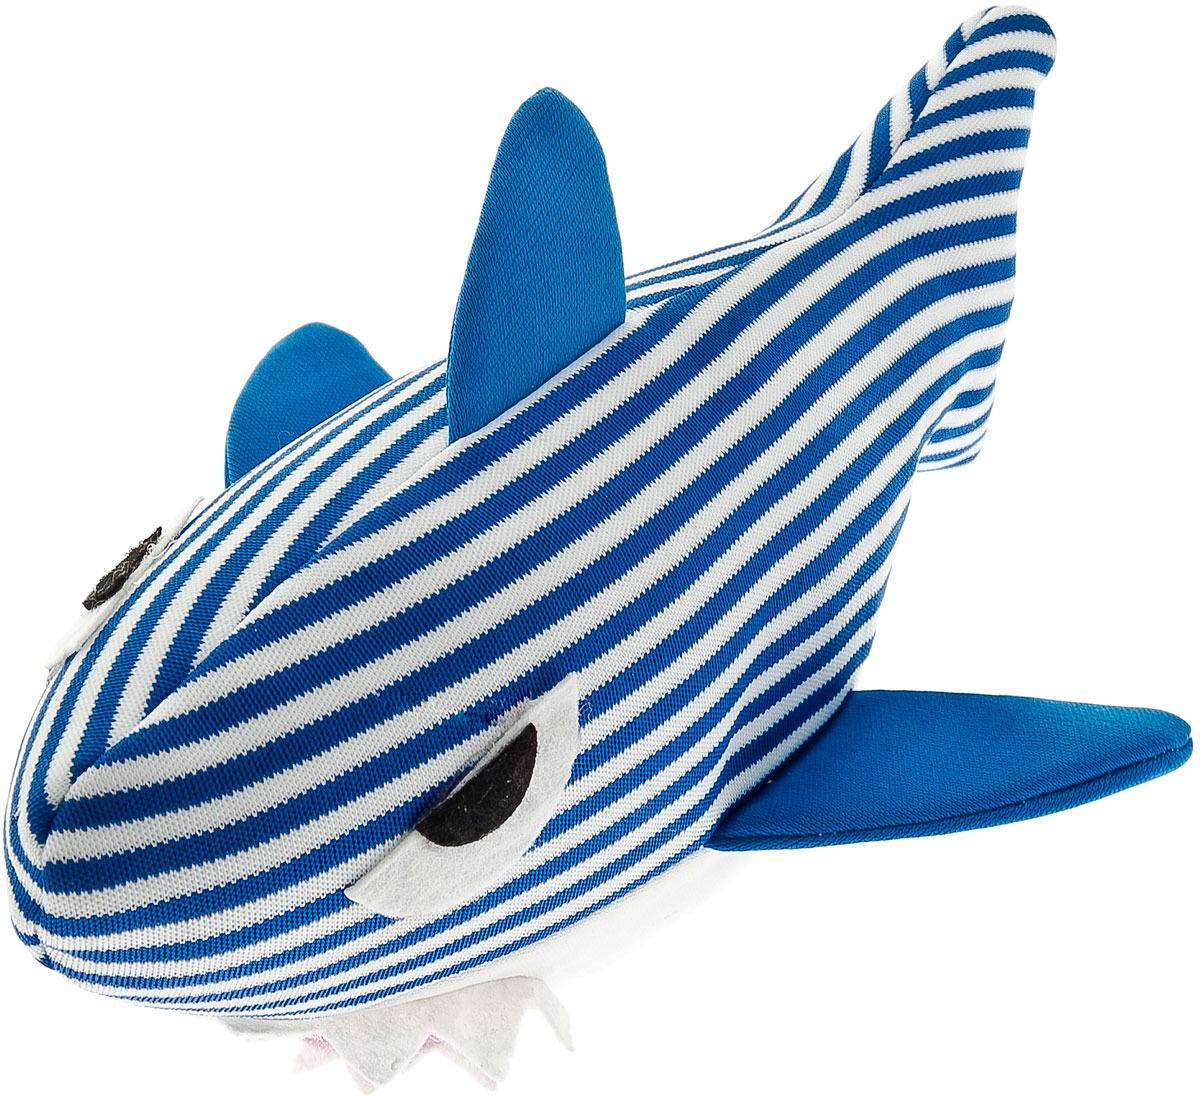 Игрушка для животных Ferribiella Squalo Ocean Galleggiante Акула, не тонущая, 47322, 16 х 27 см